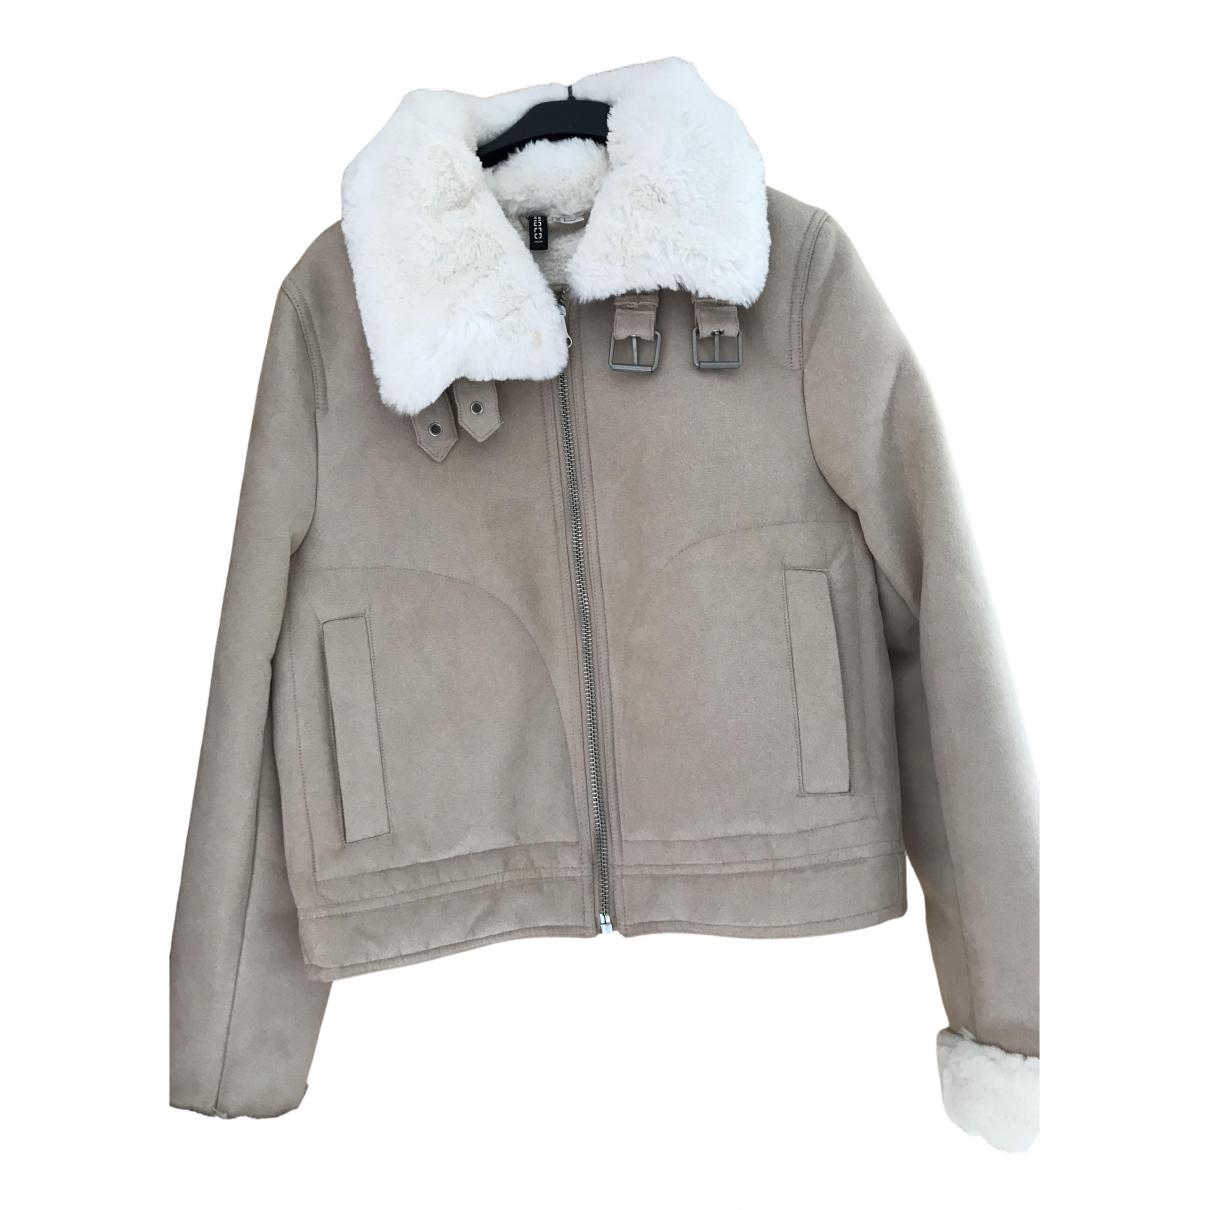 H&m Studio \N Beige coat for Women 36 FR